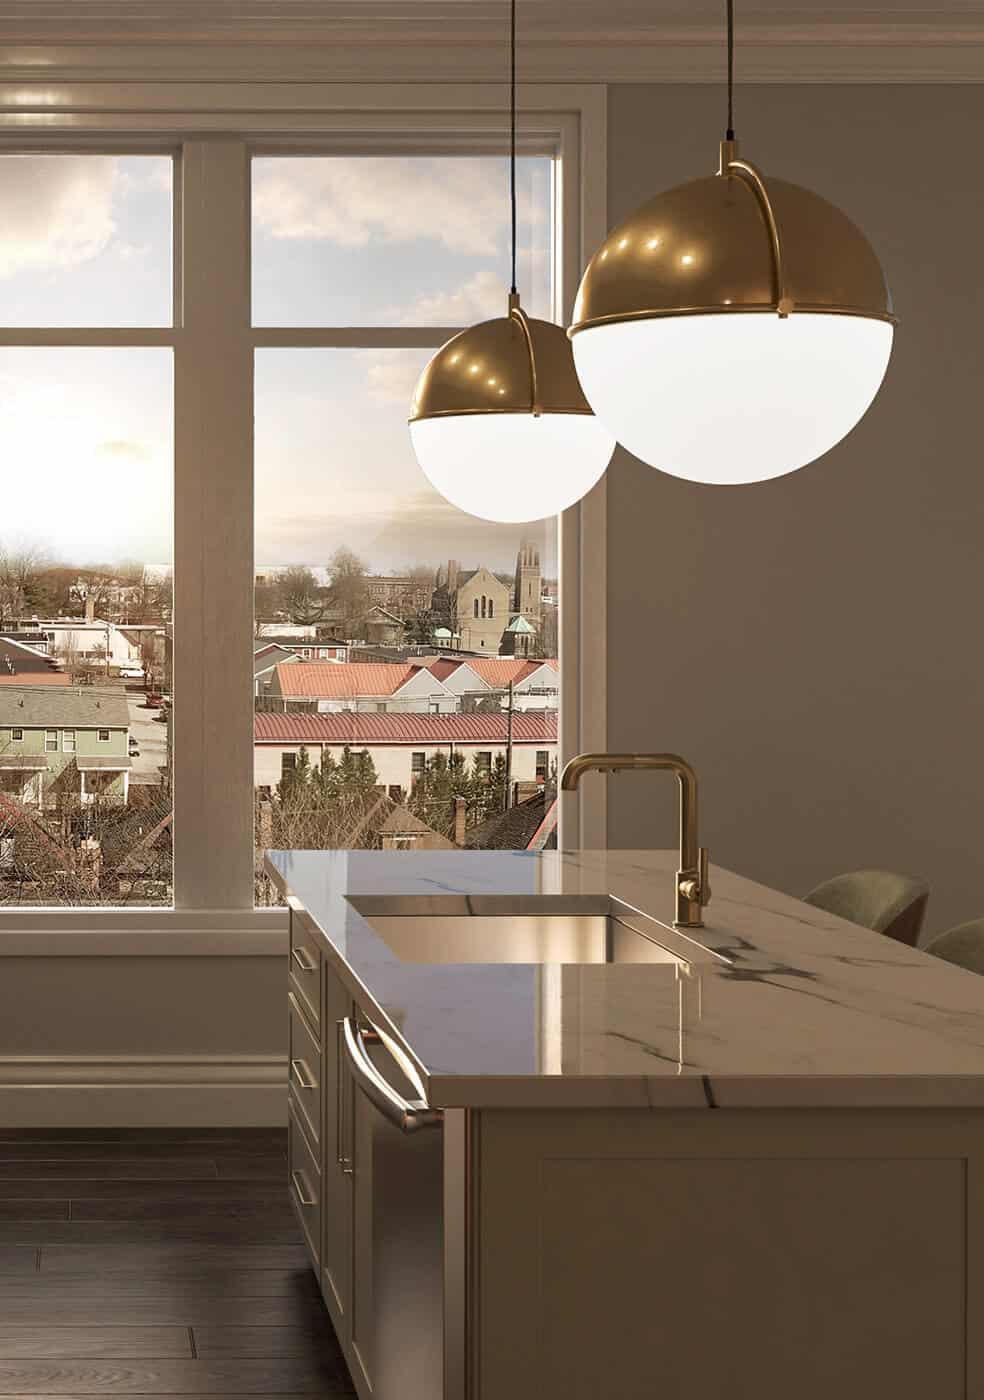 07_brunner-kitchen.jpg